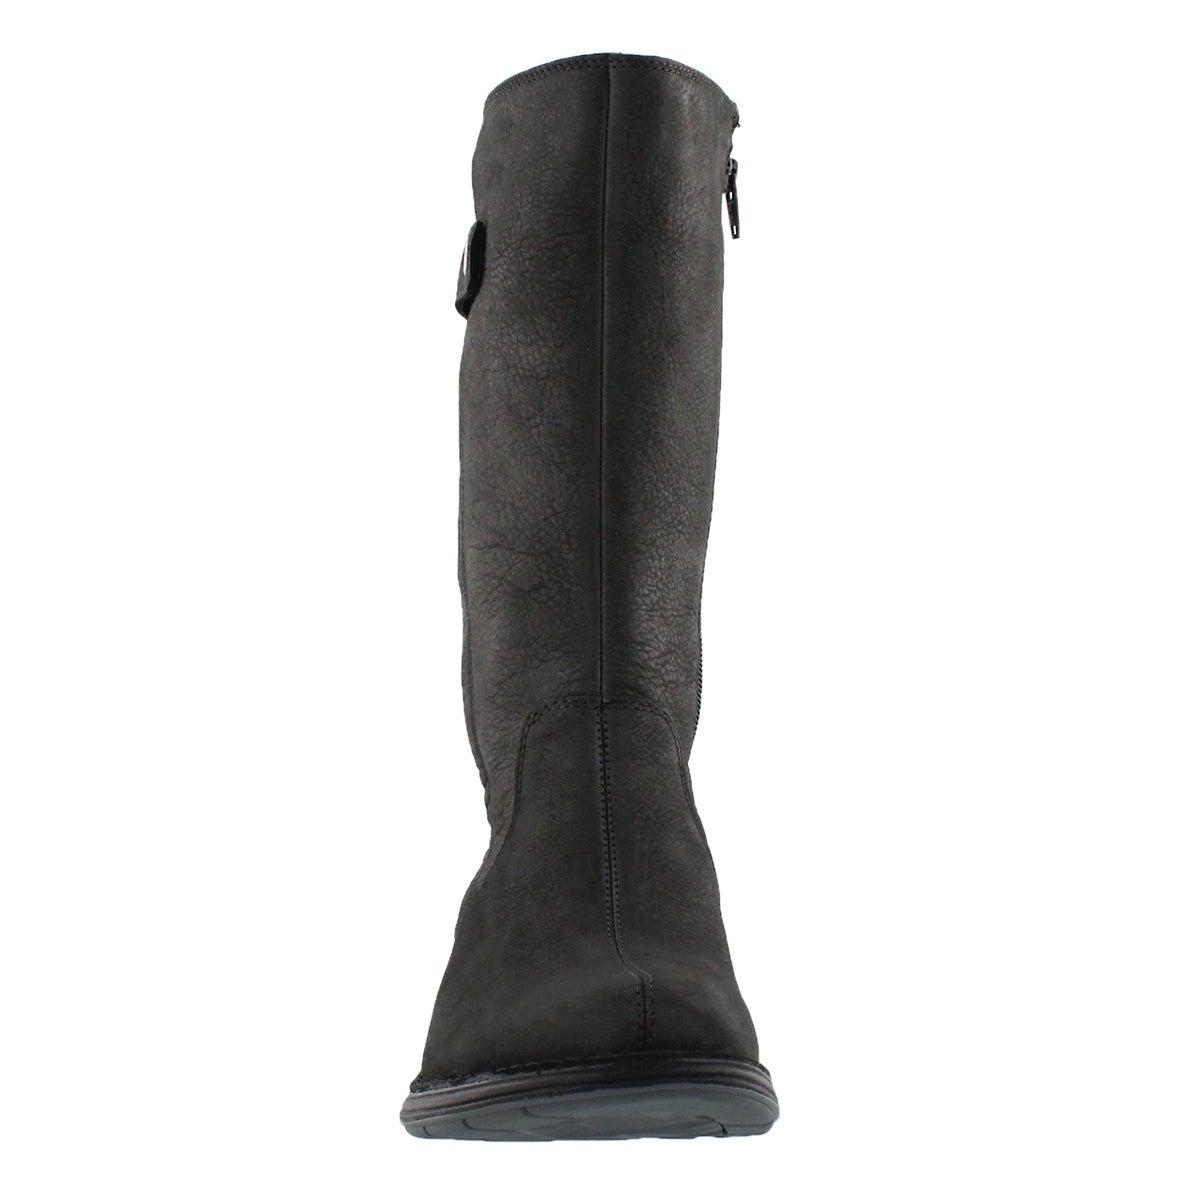 Lds Travvy Tall blk wtpf mid-calf boot